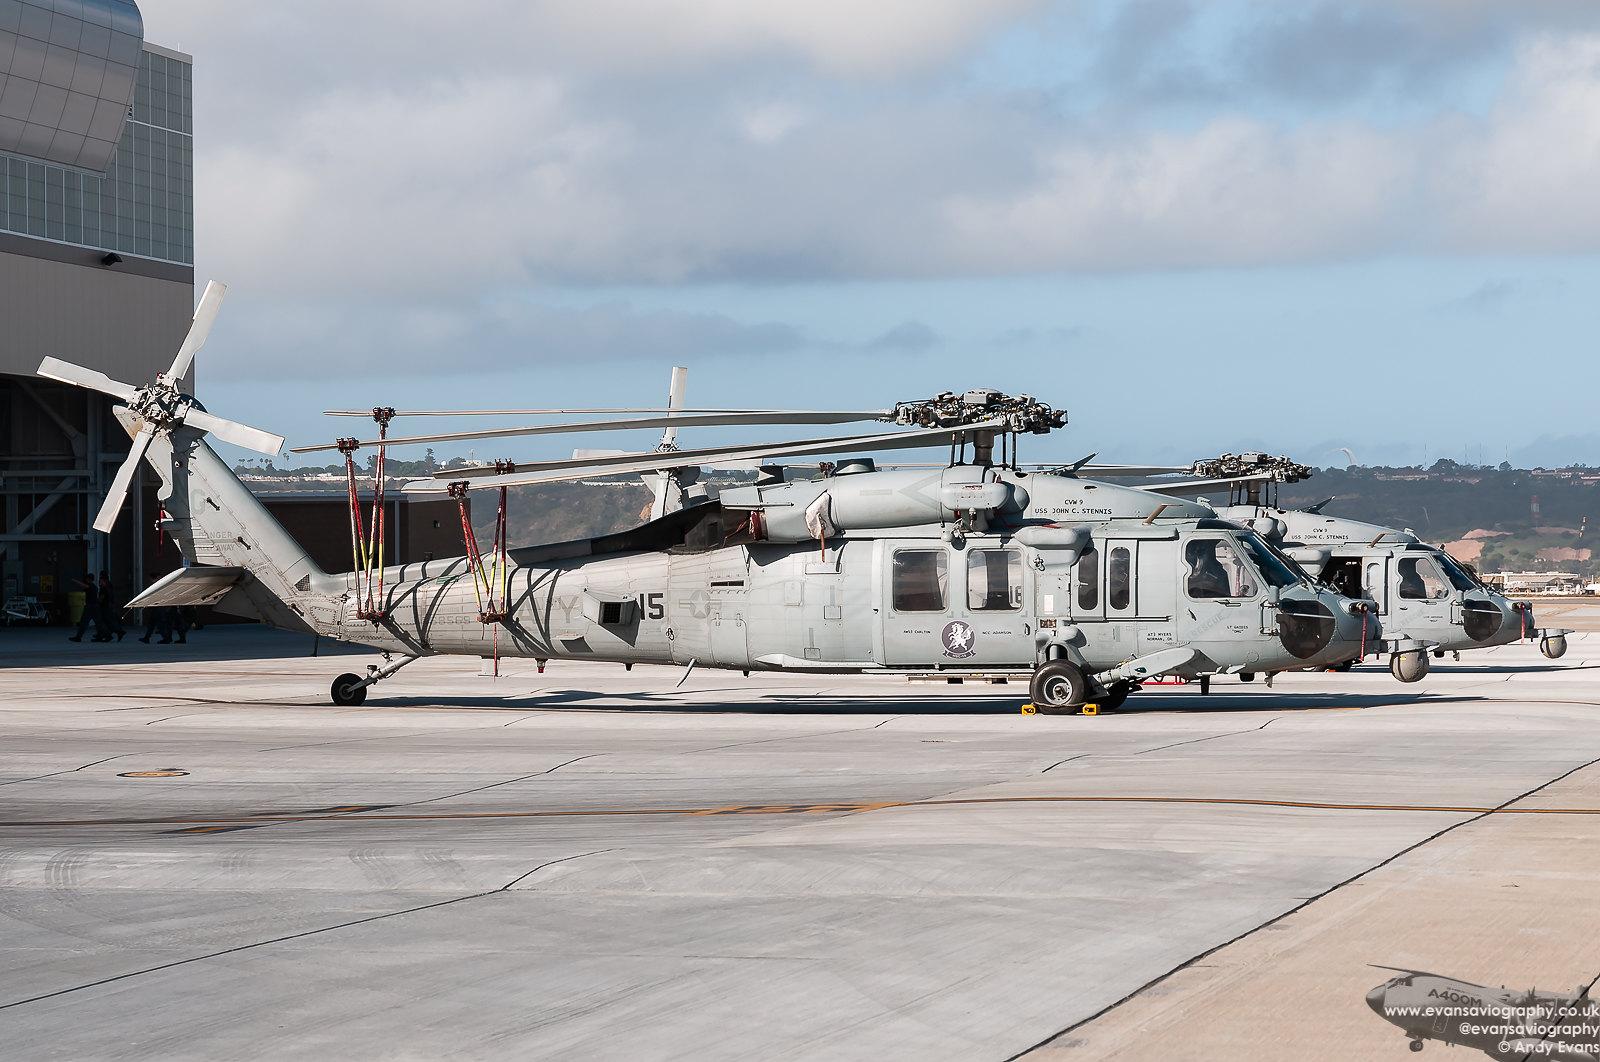 168569 MH-60S HSC-4